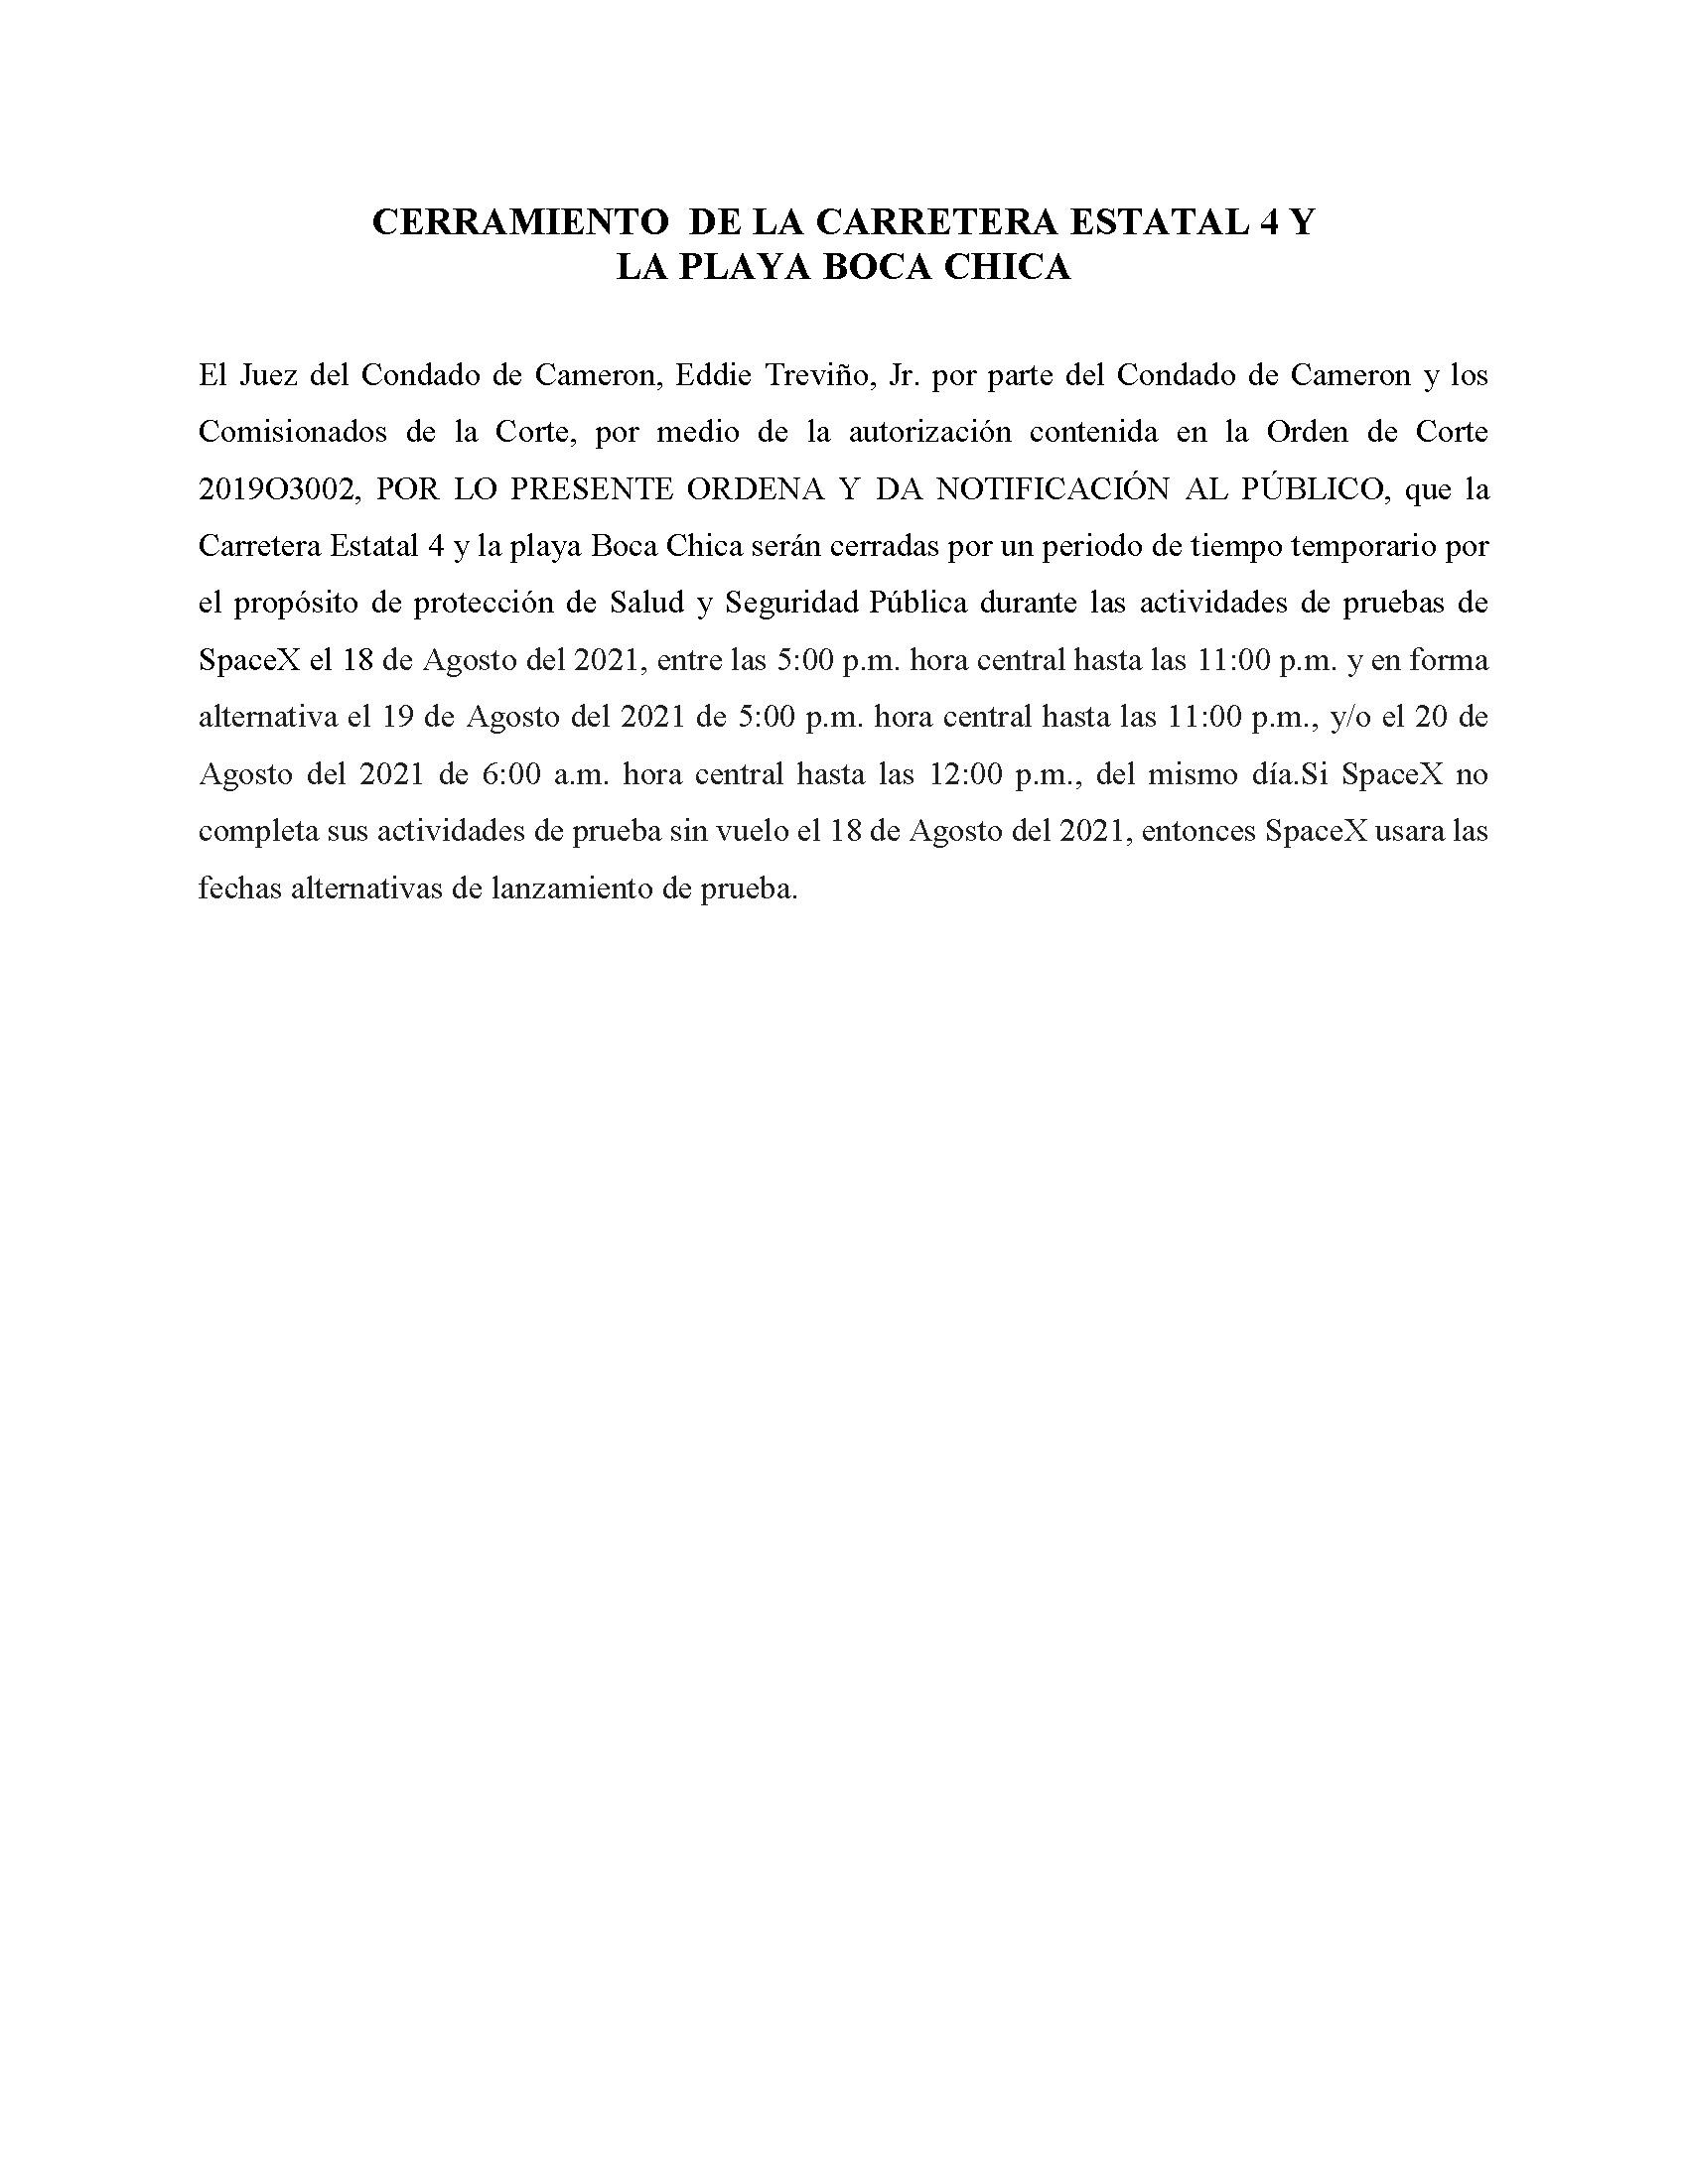 ORDER.CLOSURE OF HIGHWAY 4 Y LA PLAYA BOCA CHICA.SPANISH.08.18.2021